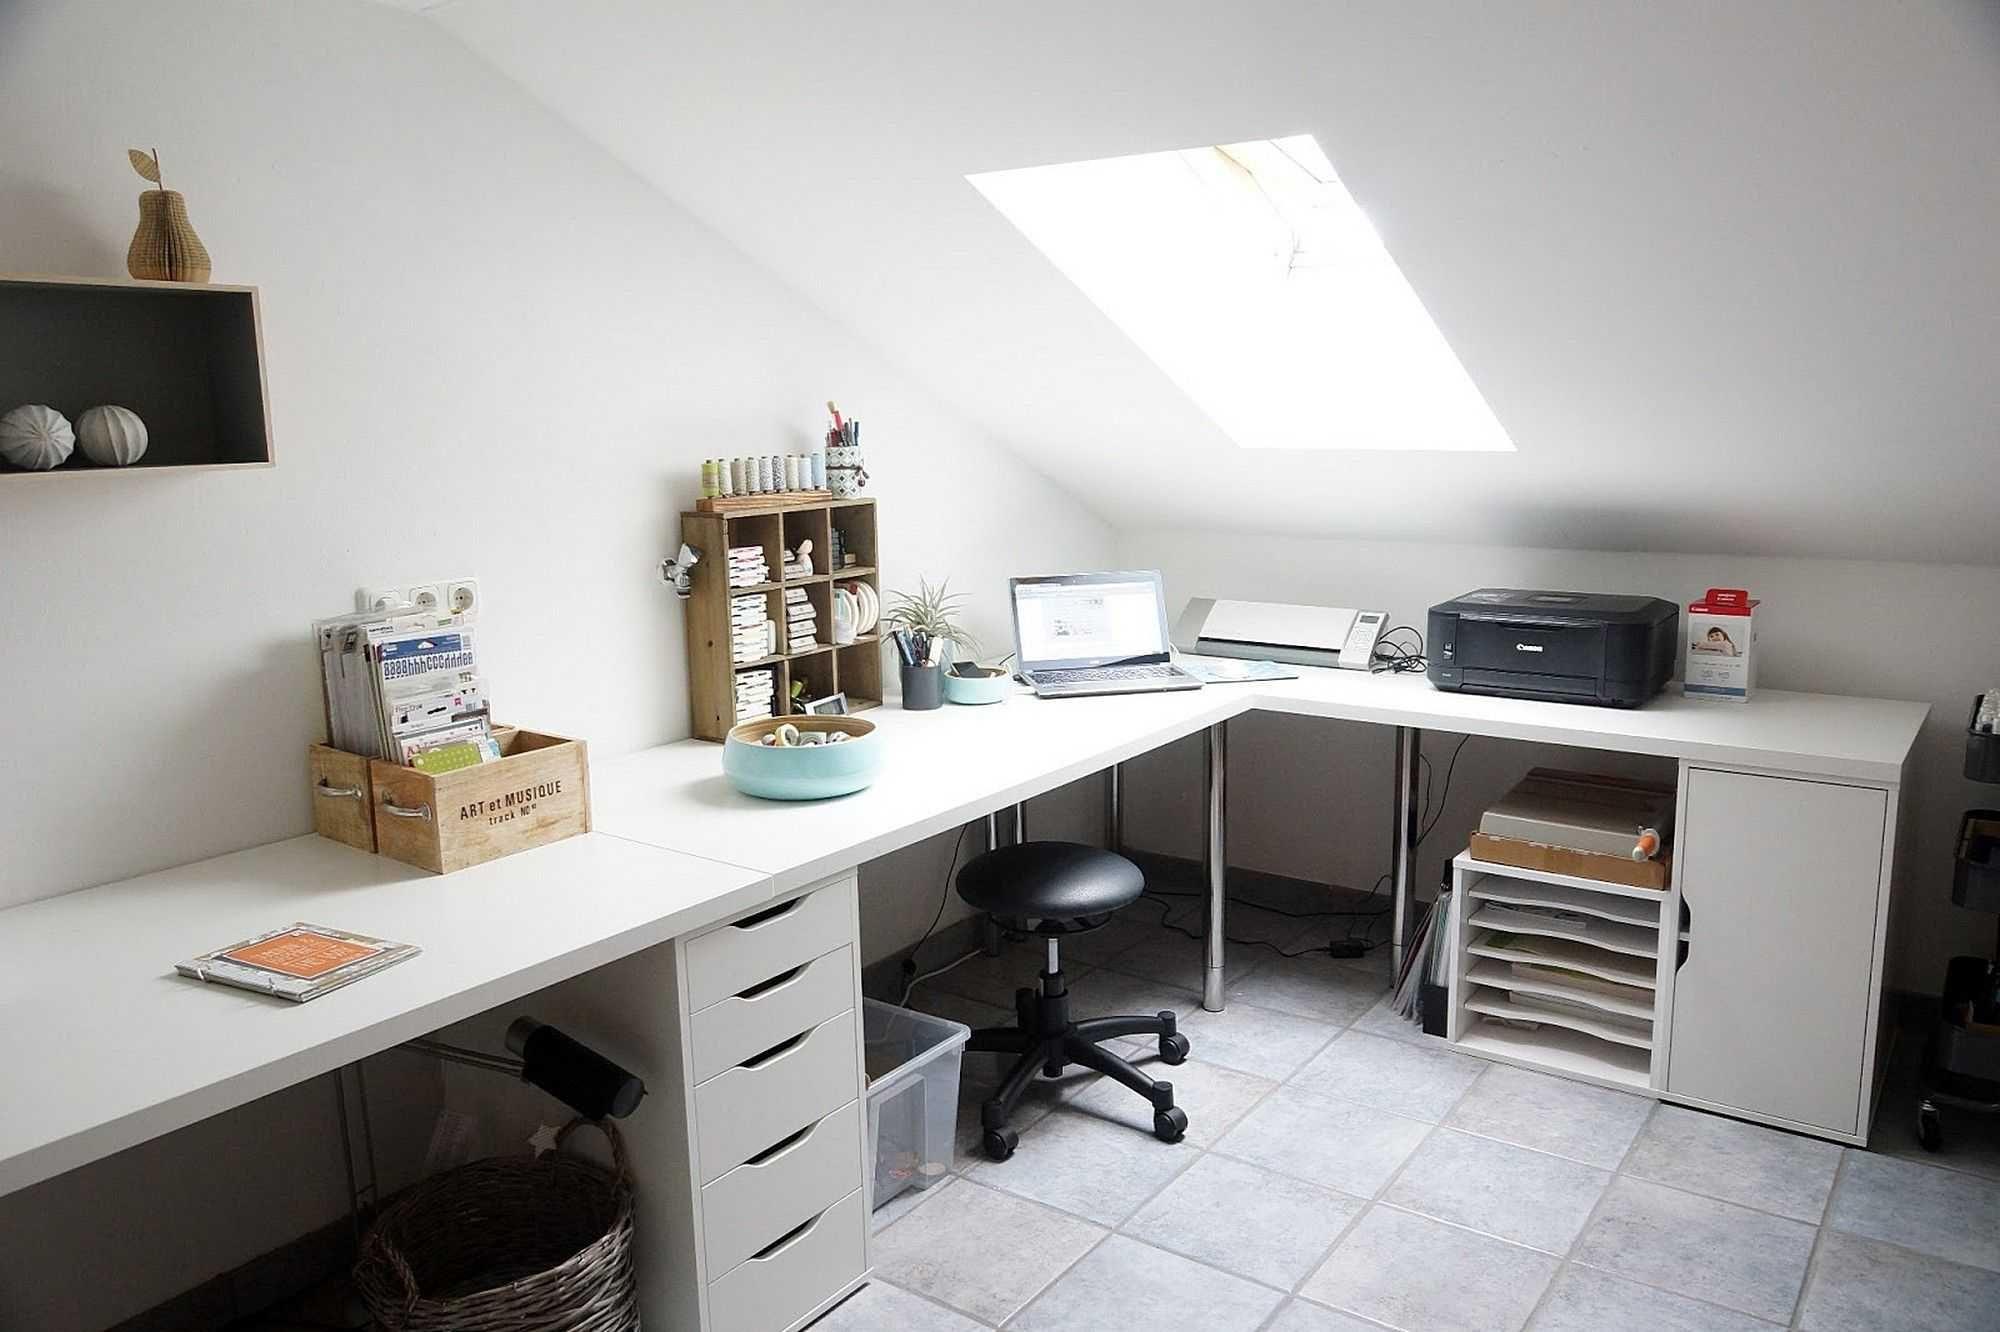 Home desk home fice corner desk setup ikea linnmon adils from